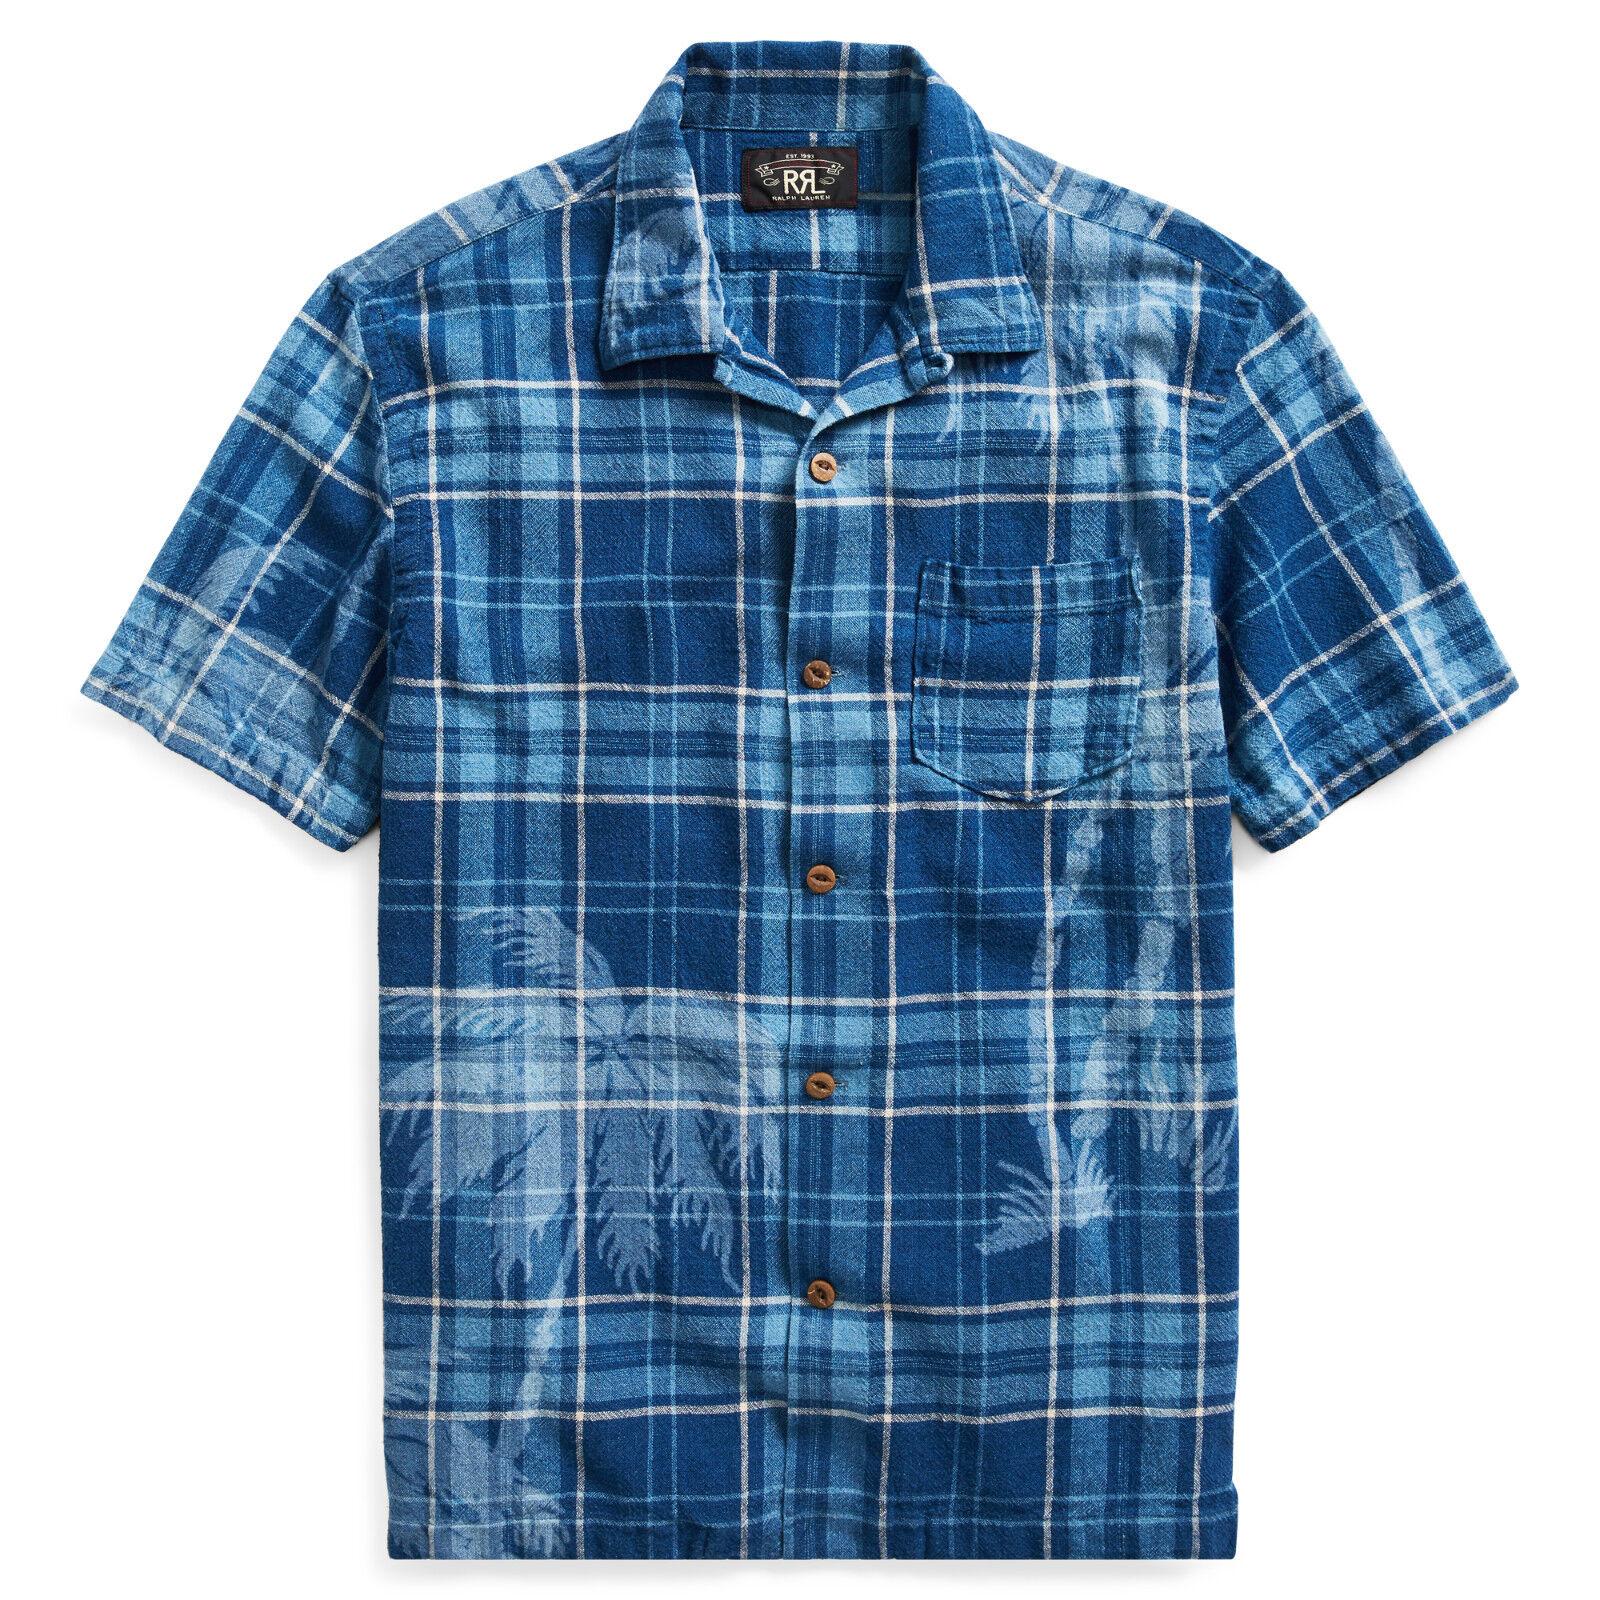 Ralph Lauren Rrl Indigo Baumwolle Leinen Farrell Palmen Motiv Camp Shirt Neu     | Vollständige Spezifikation